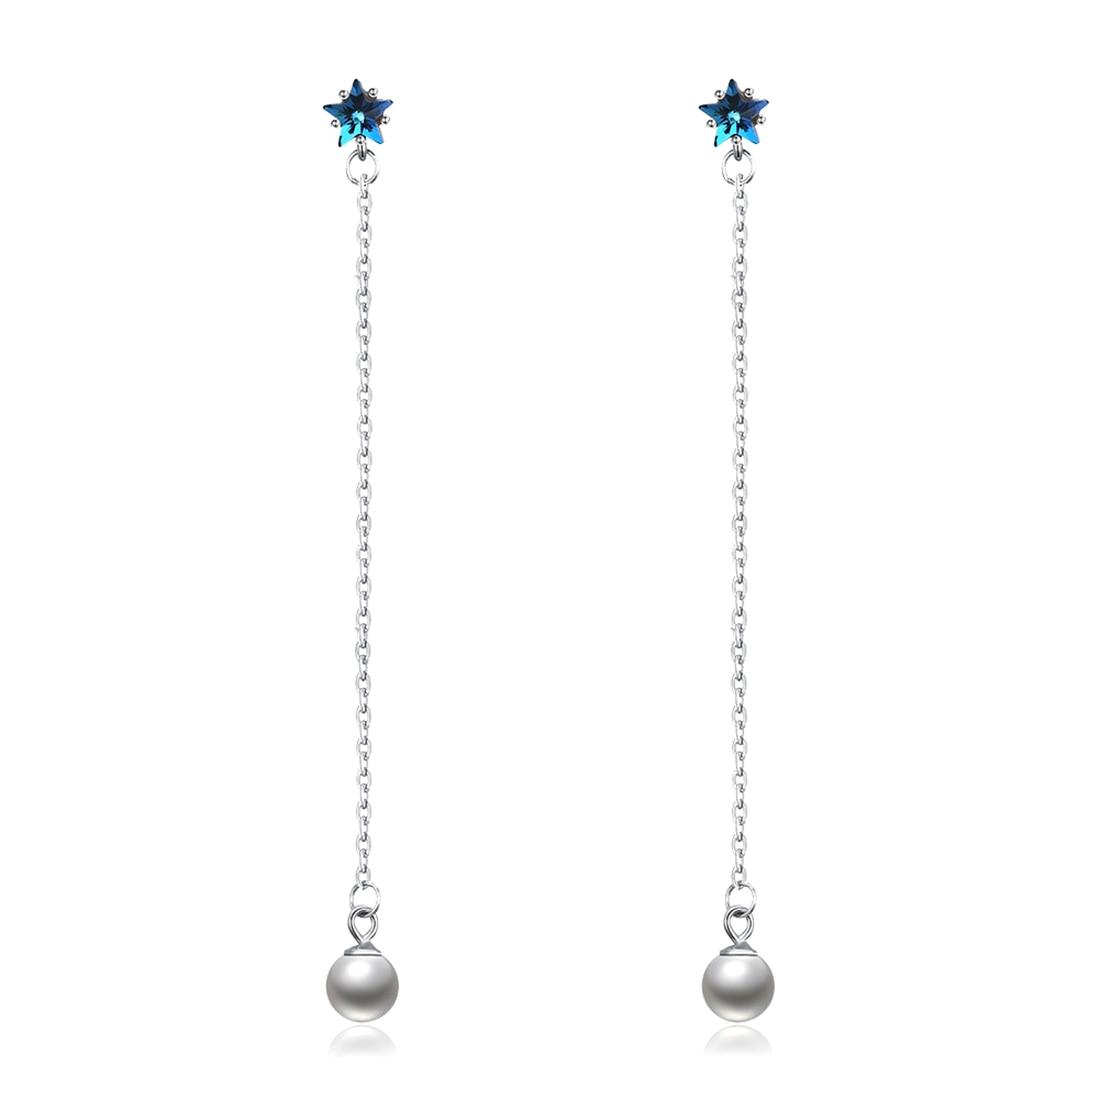 LEKANI Crystals from Swarovski Element 925 Sterling Silver Drop Earrings Blue Jewelry Beads Long Chain Pearl Pendant Earrings